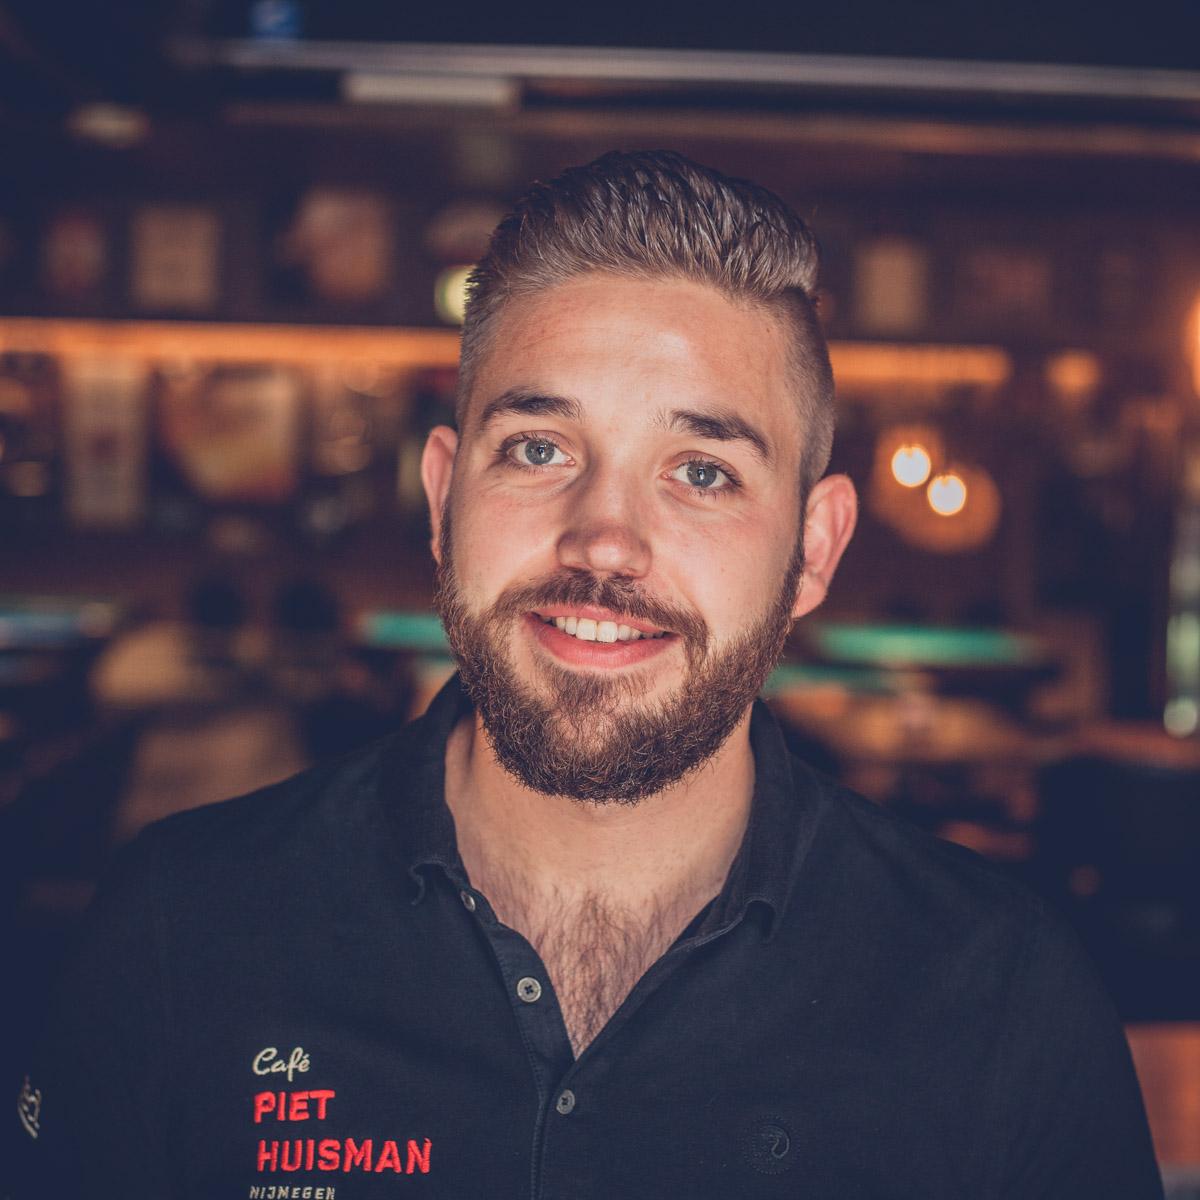 Café Piet Huisman Team Maurice